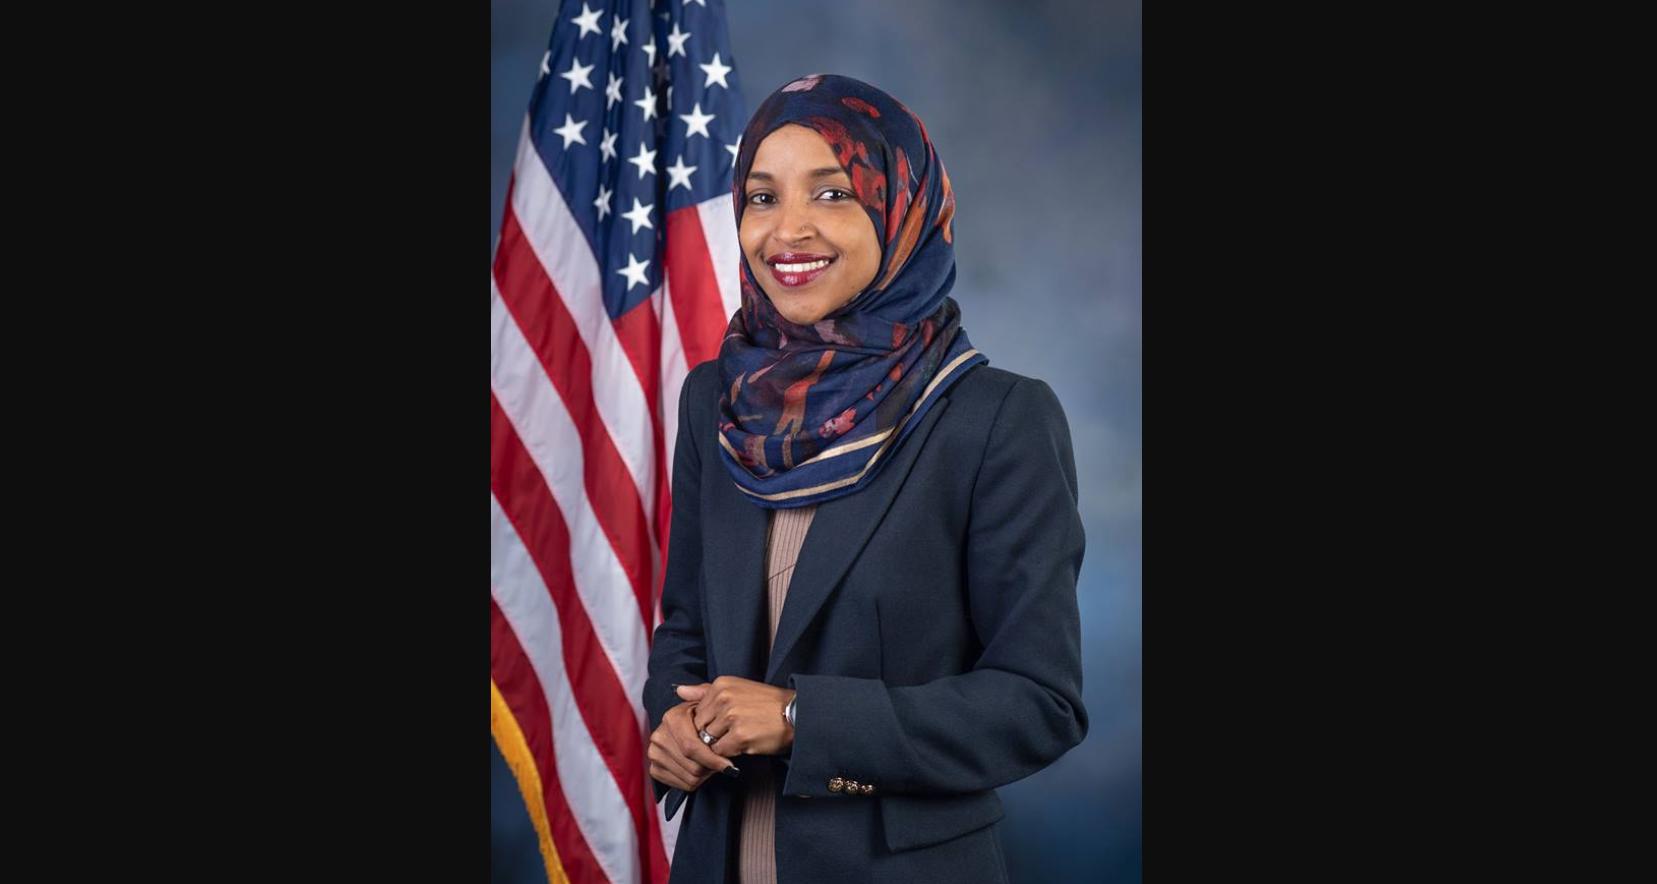 Omar claps back at Alabama GOP resolution against her